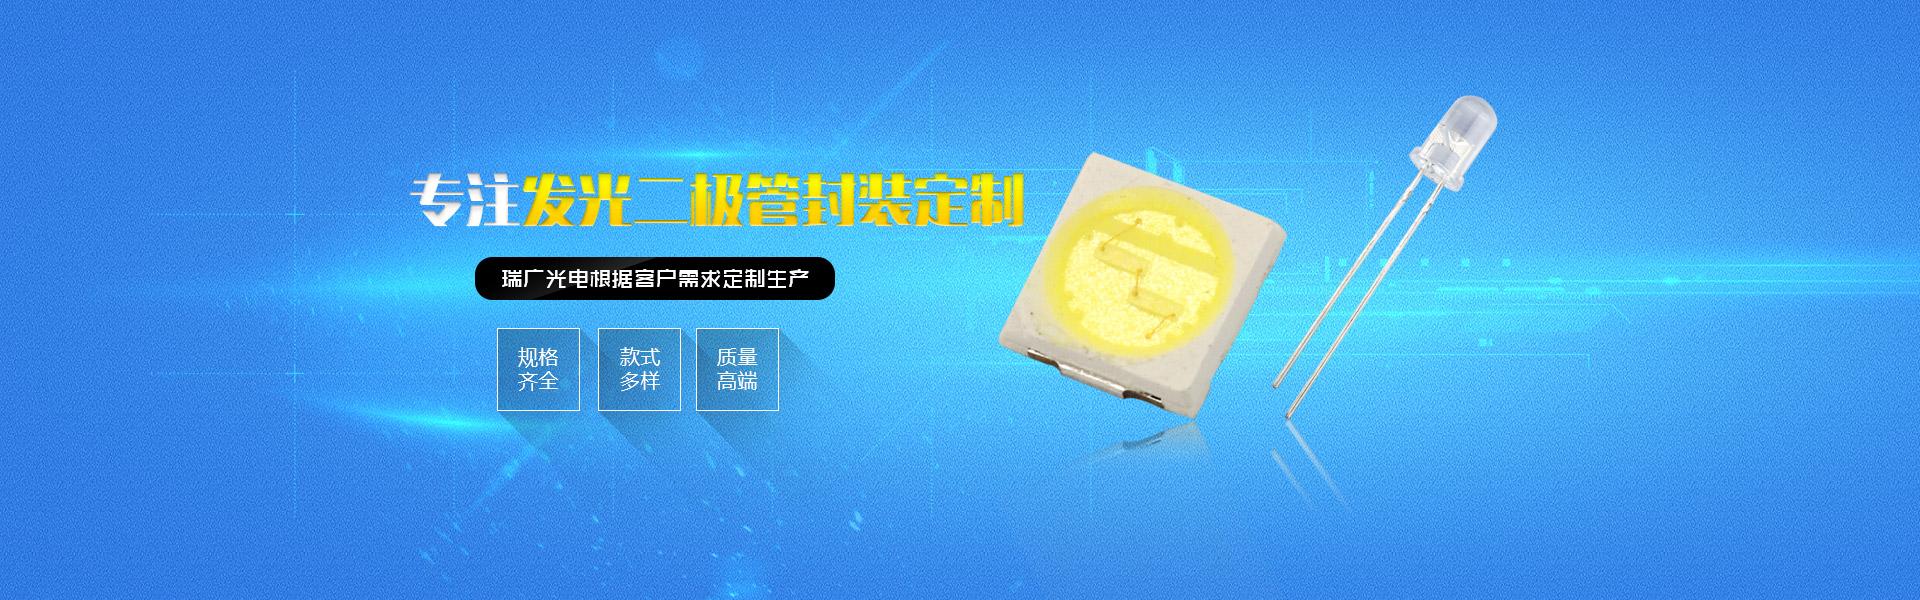 LED发光二极管厂家